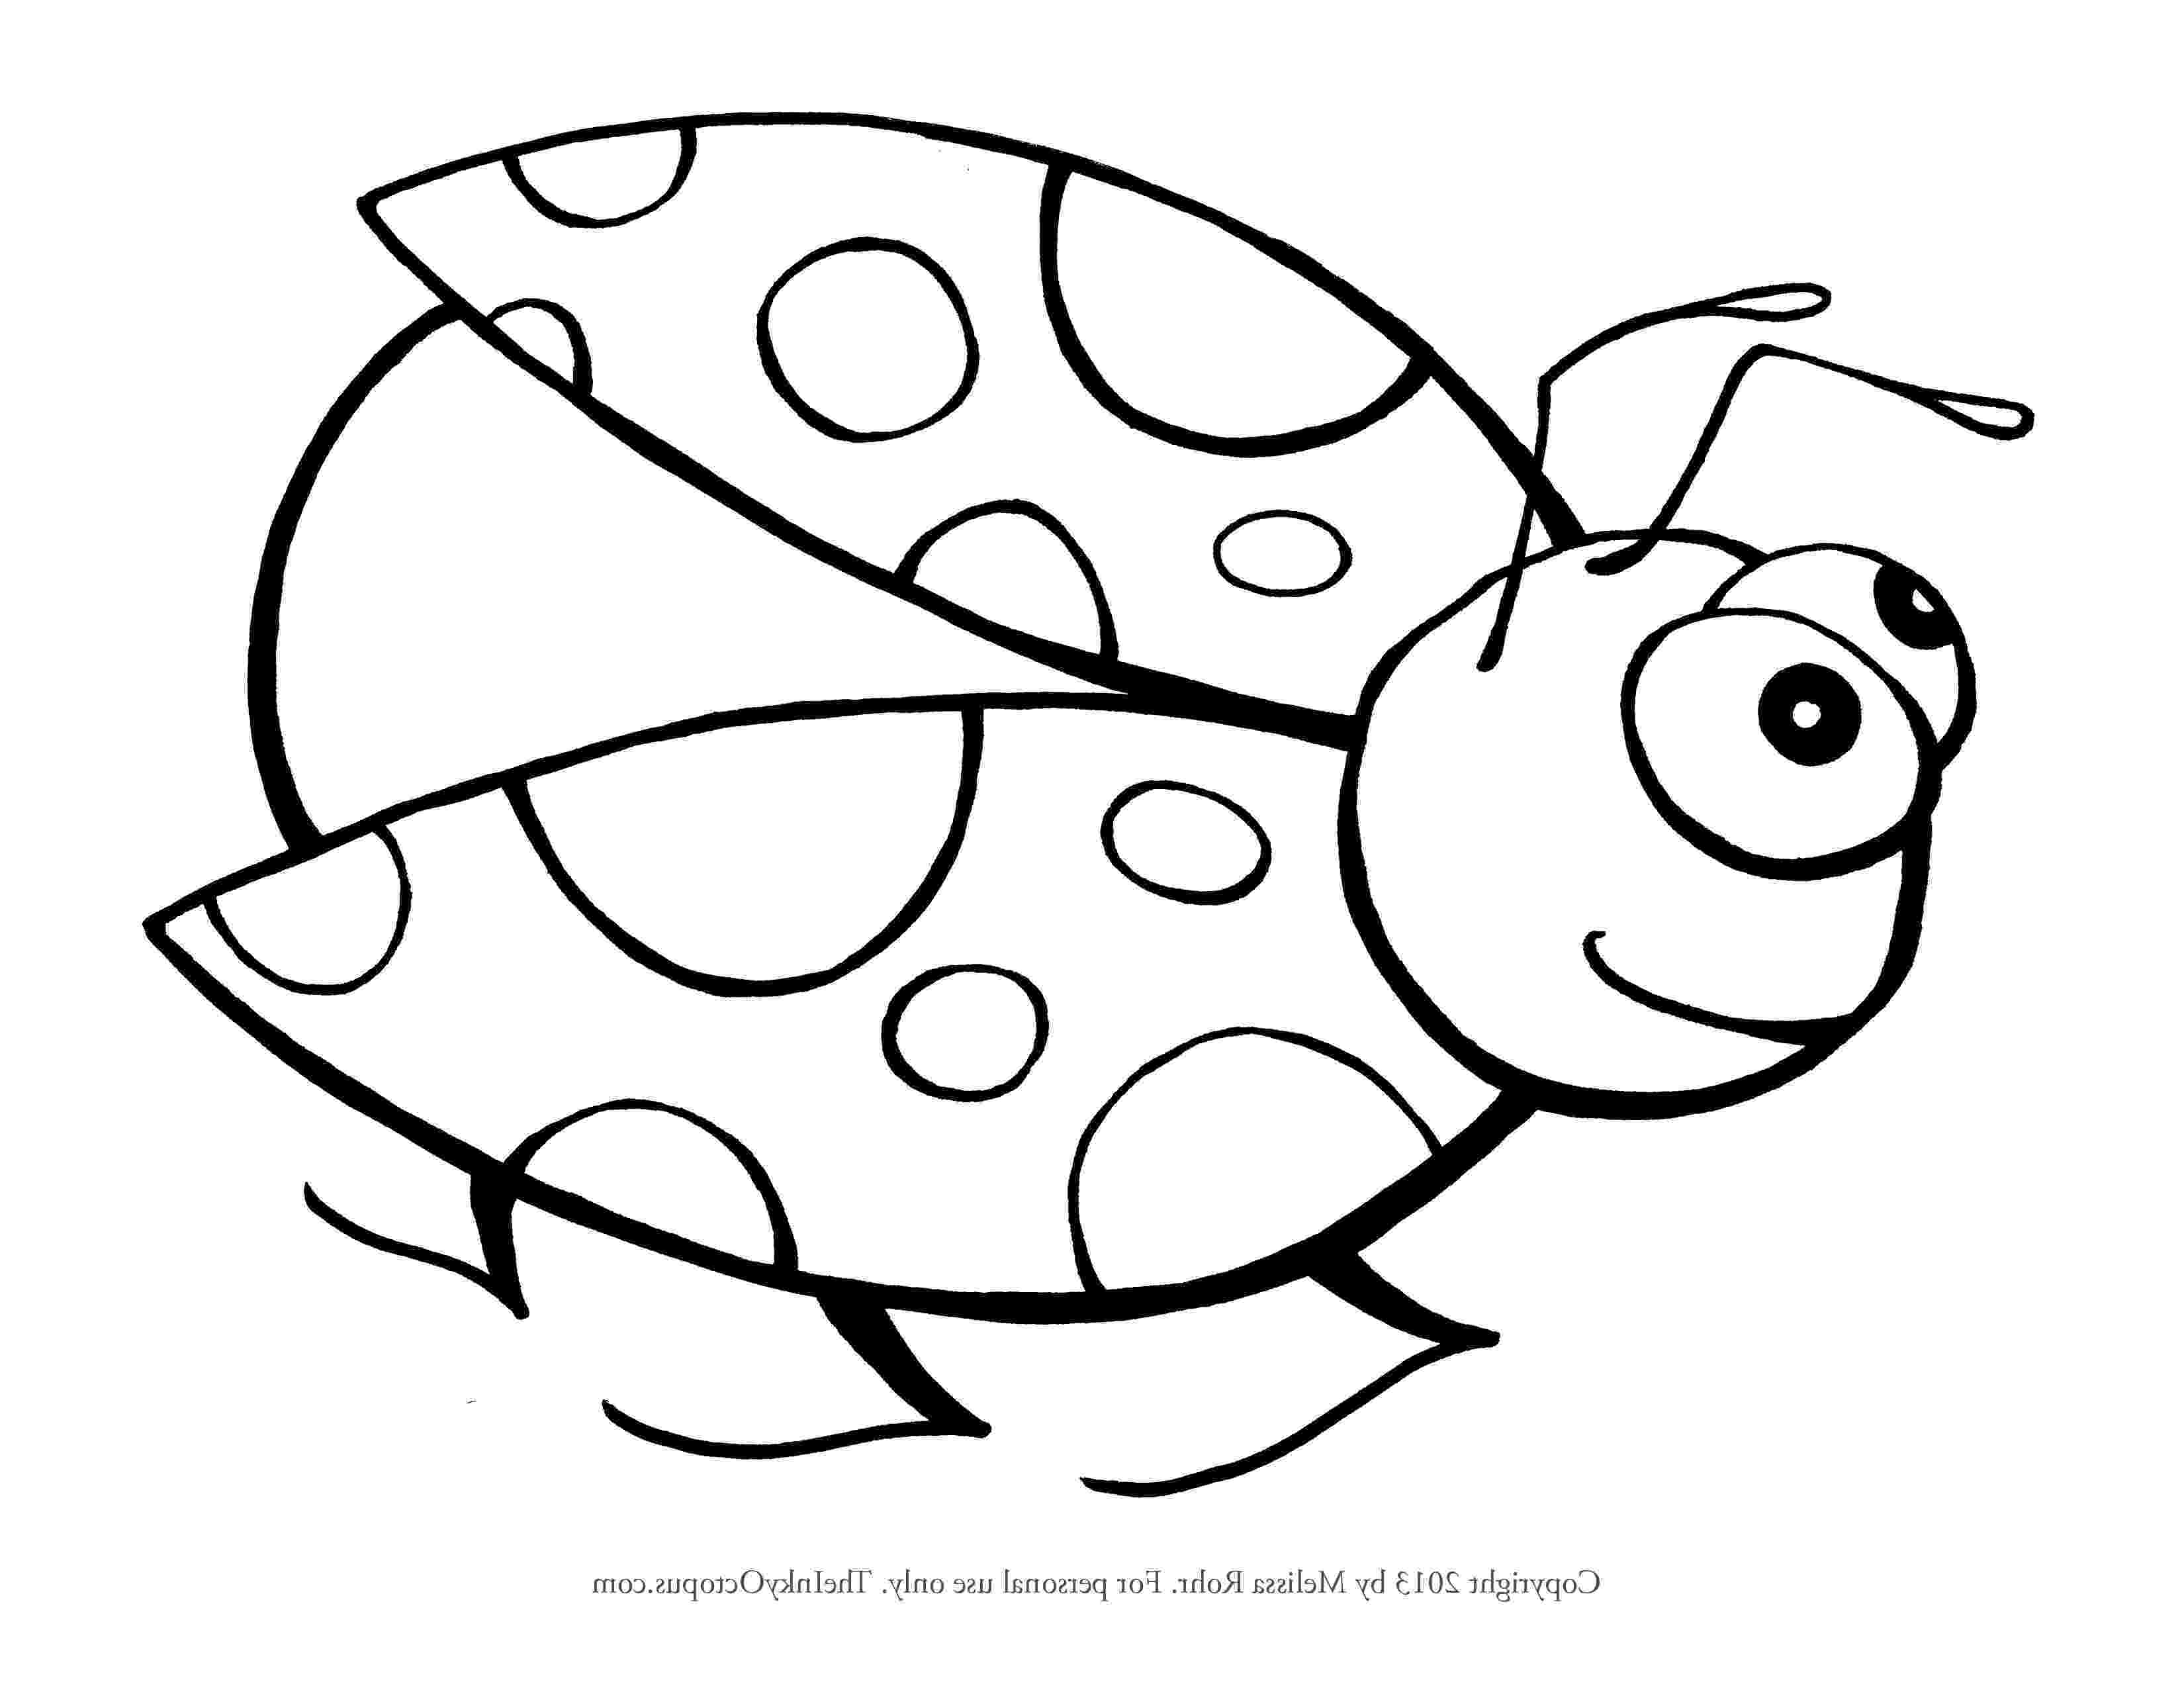 coloring page ladybug ladybug cartoon drawing at getdrawingscom free for ladybug coloring page